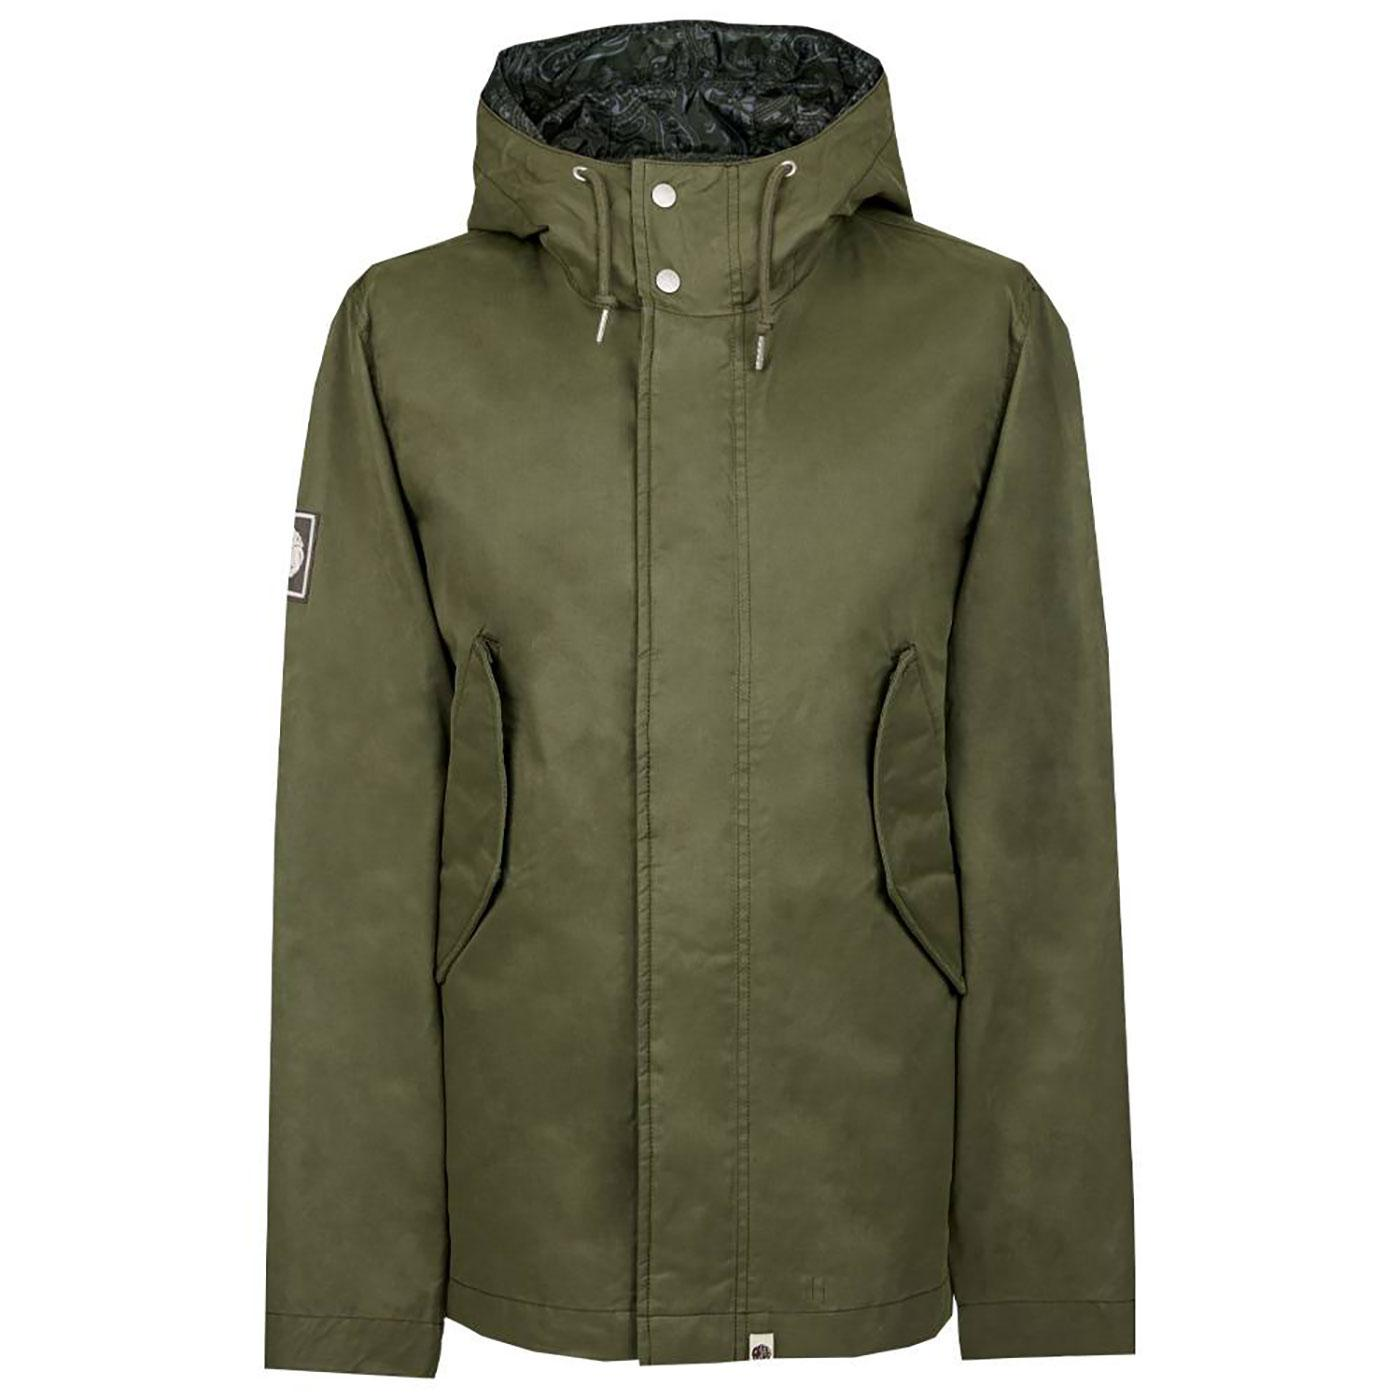 PRETTY GREEN Retro Mod Hooded Cotton Jacket GREEN